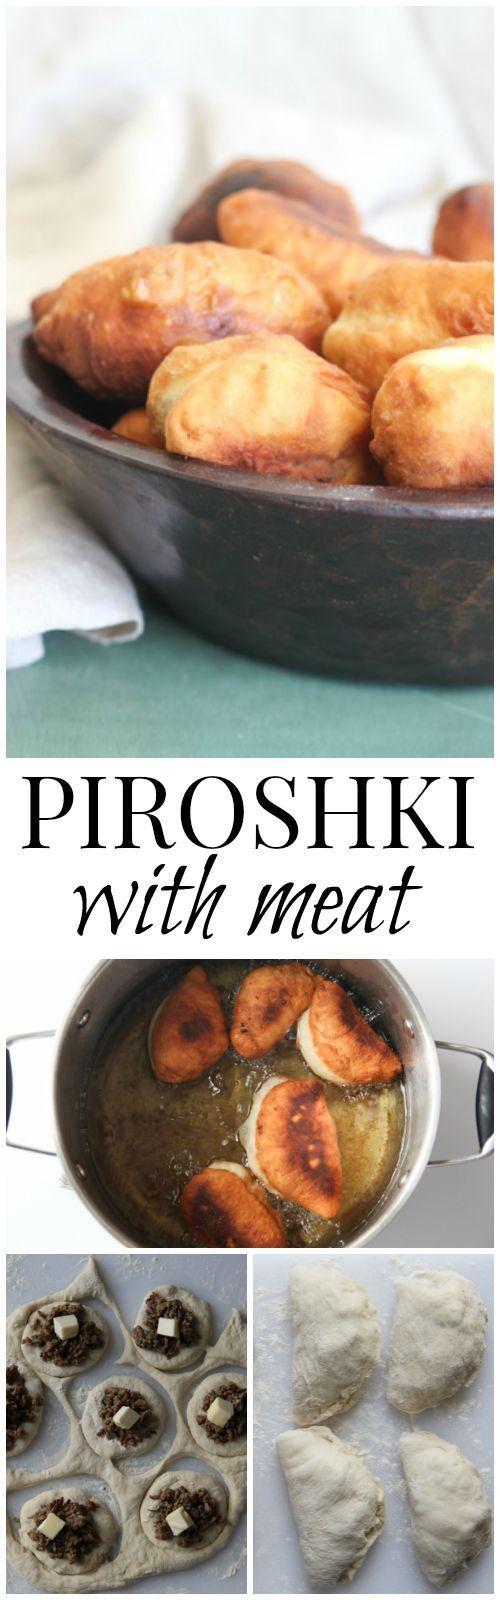 Russian Fried Piroshki with Meat. ValentinasCorner.com